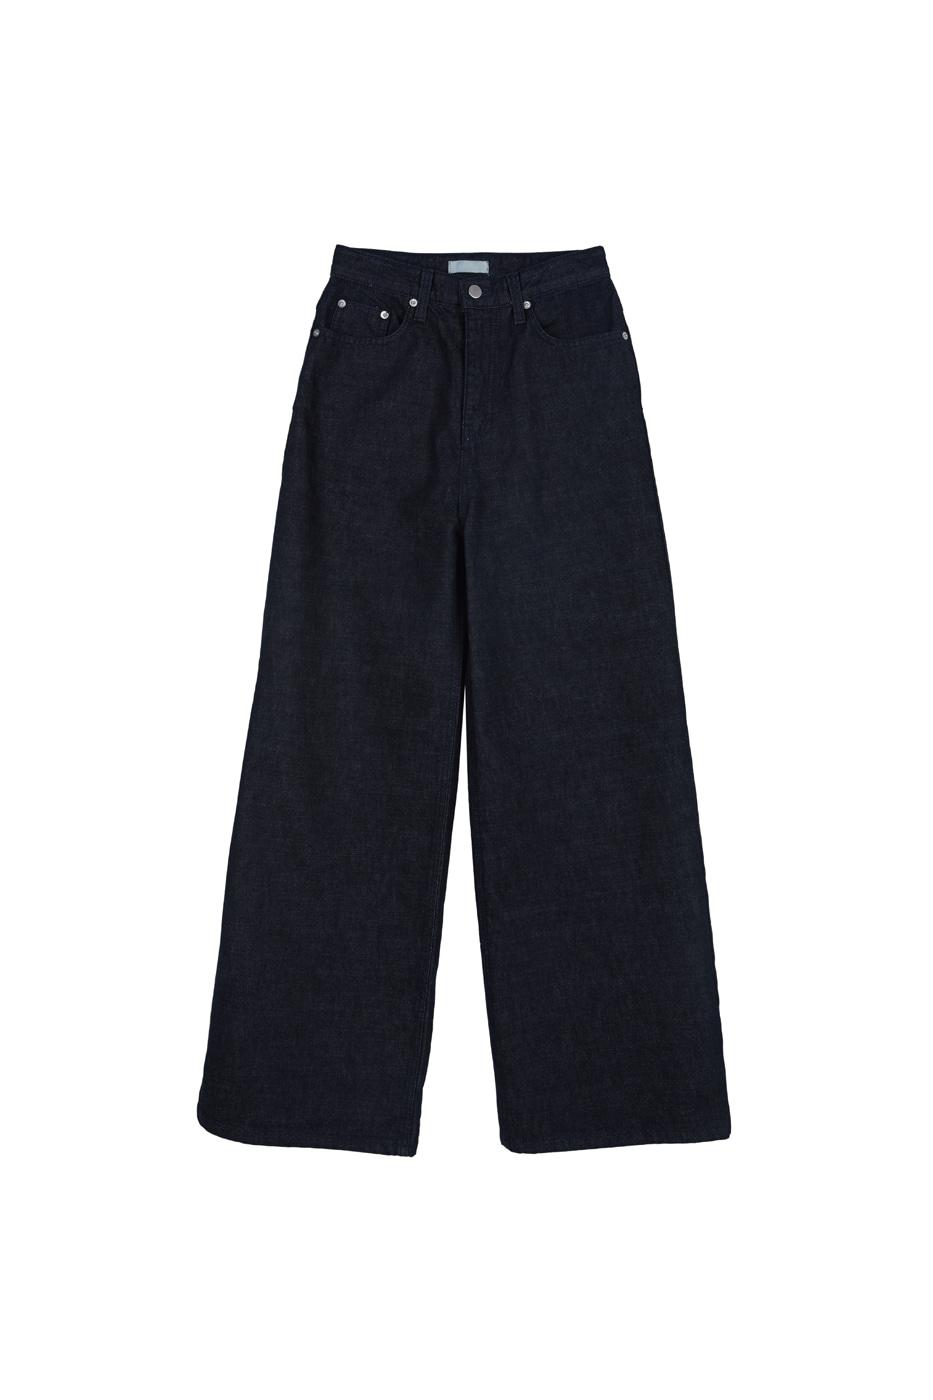 Deer blue wide jeans